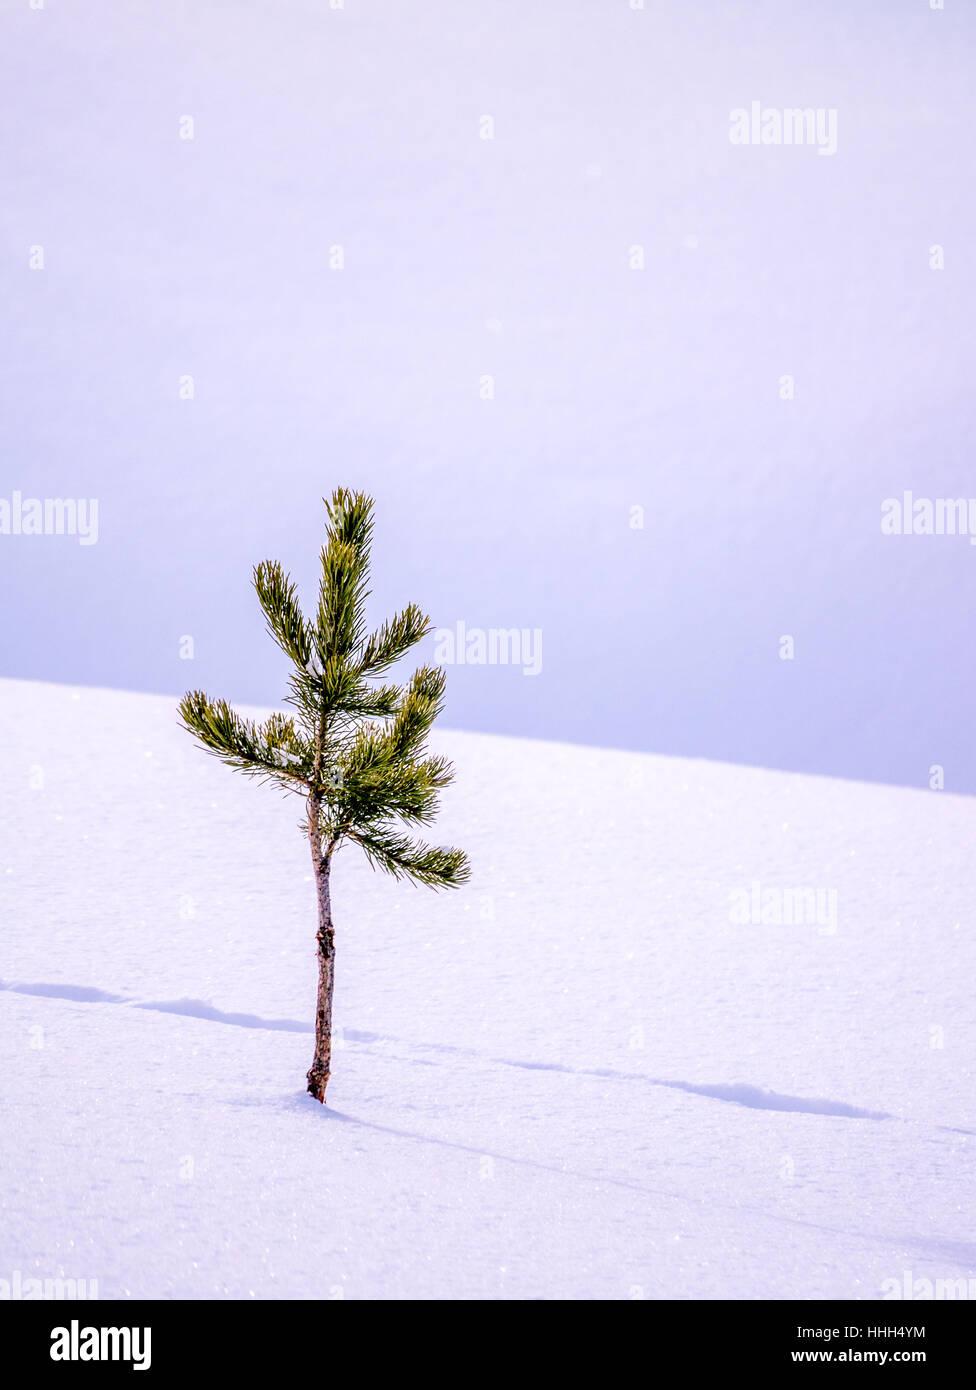 Close up of pine tree with animal tracks - Stock Image